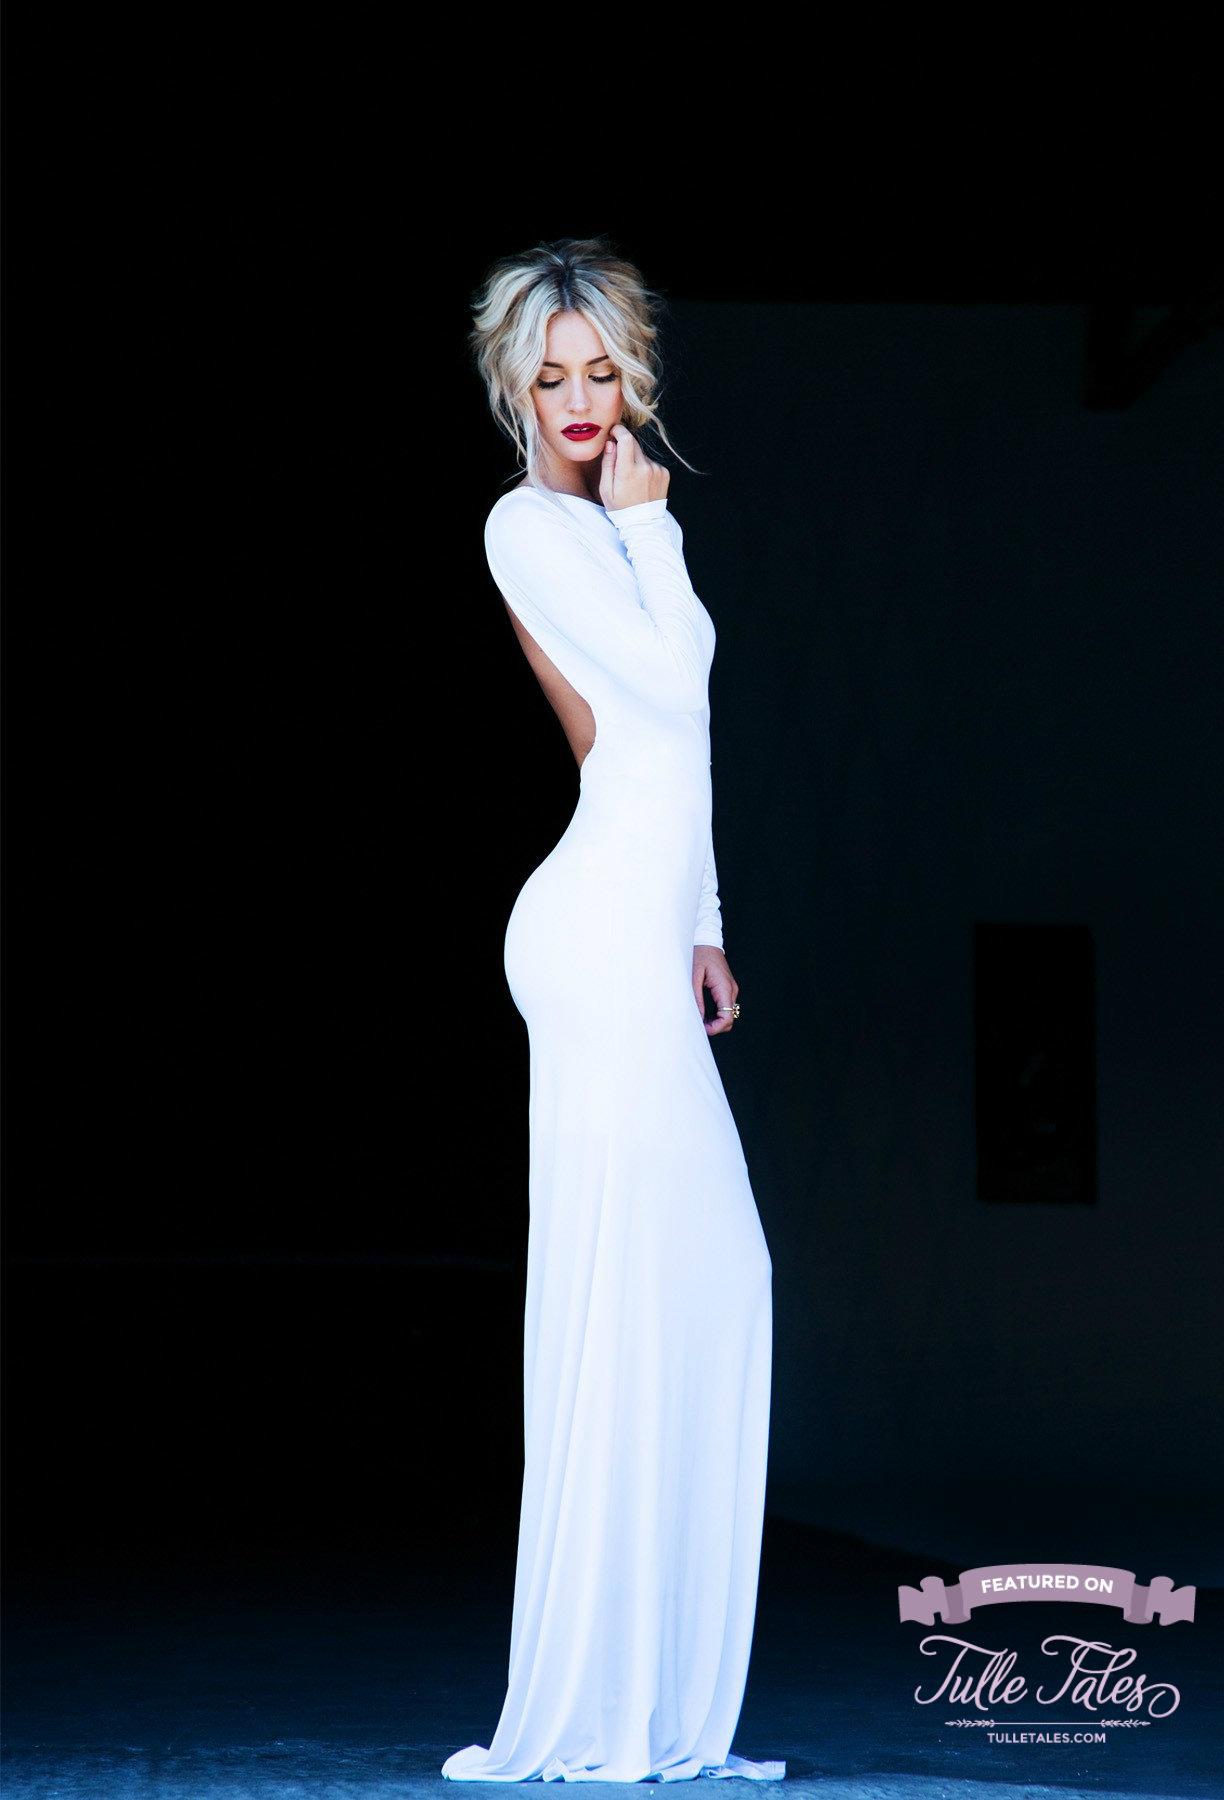 Monaco white dress [monaco white]